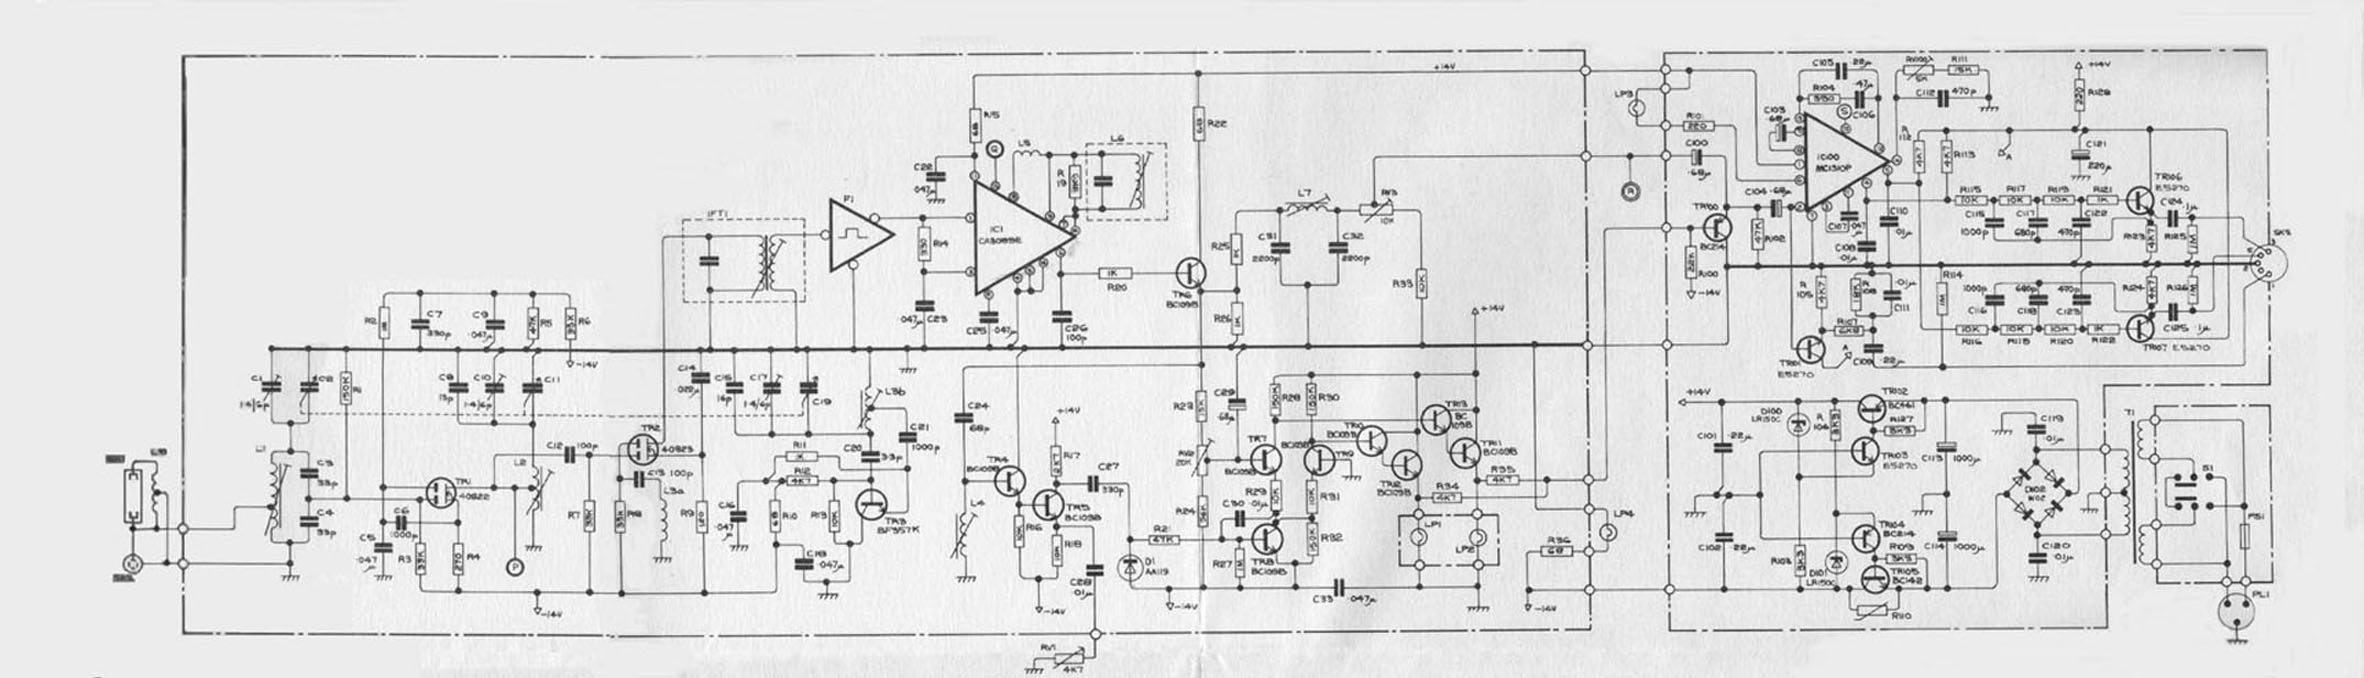 quad esl63 electrostatic speaker service diagnose repair schematic rh geocities ws FM3 Visa Application Form FM3 Visa